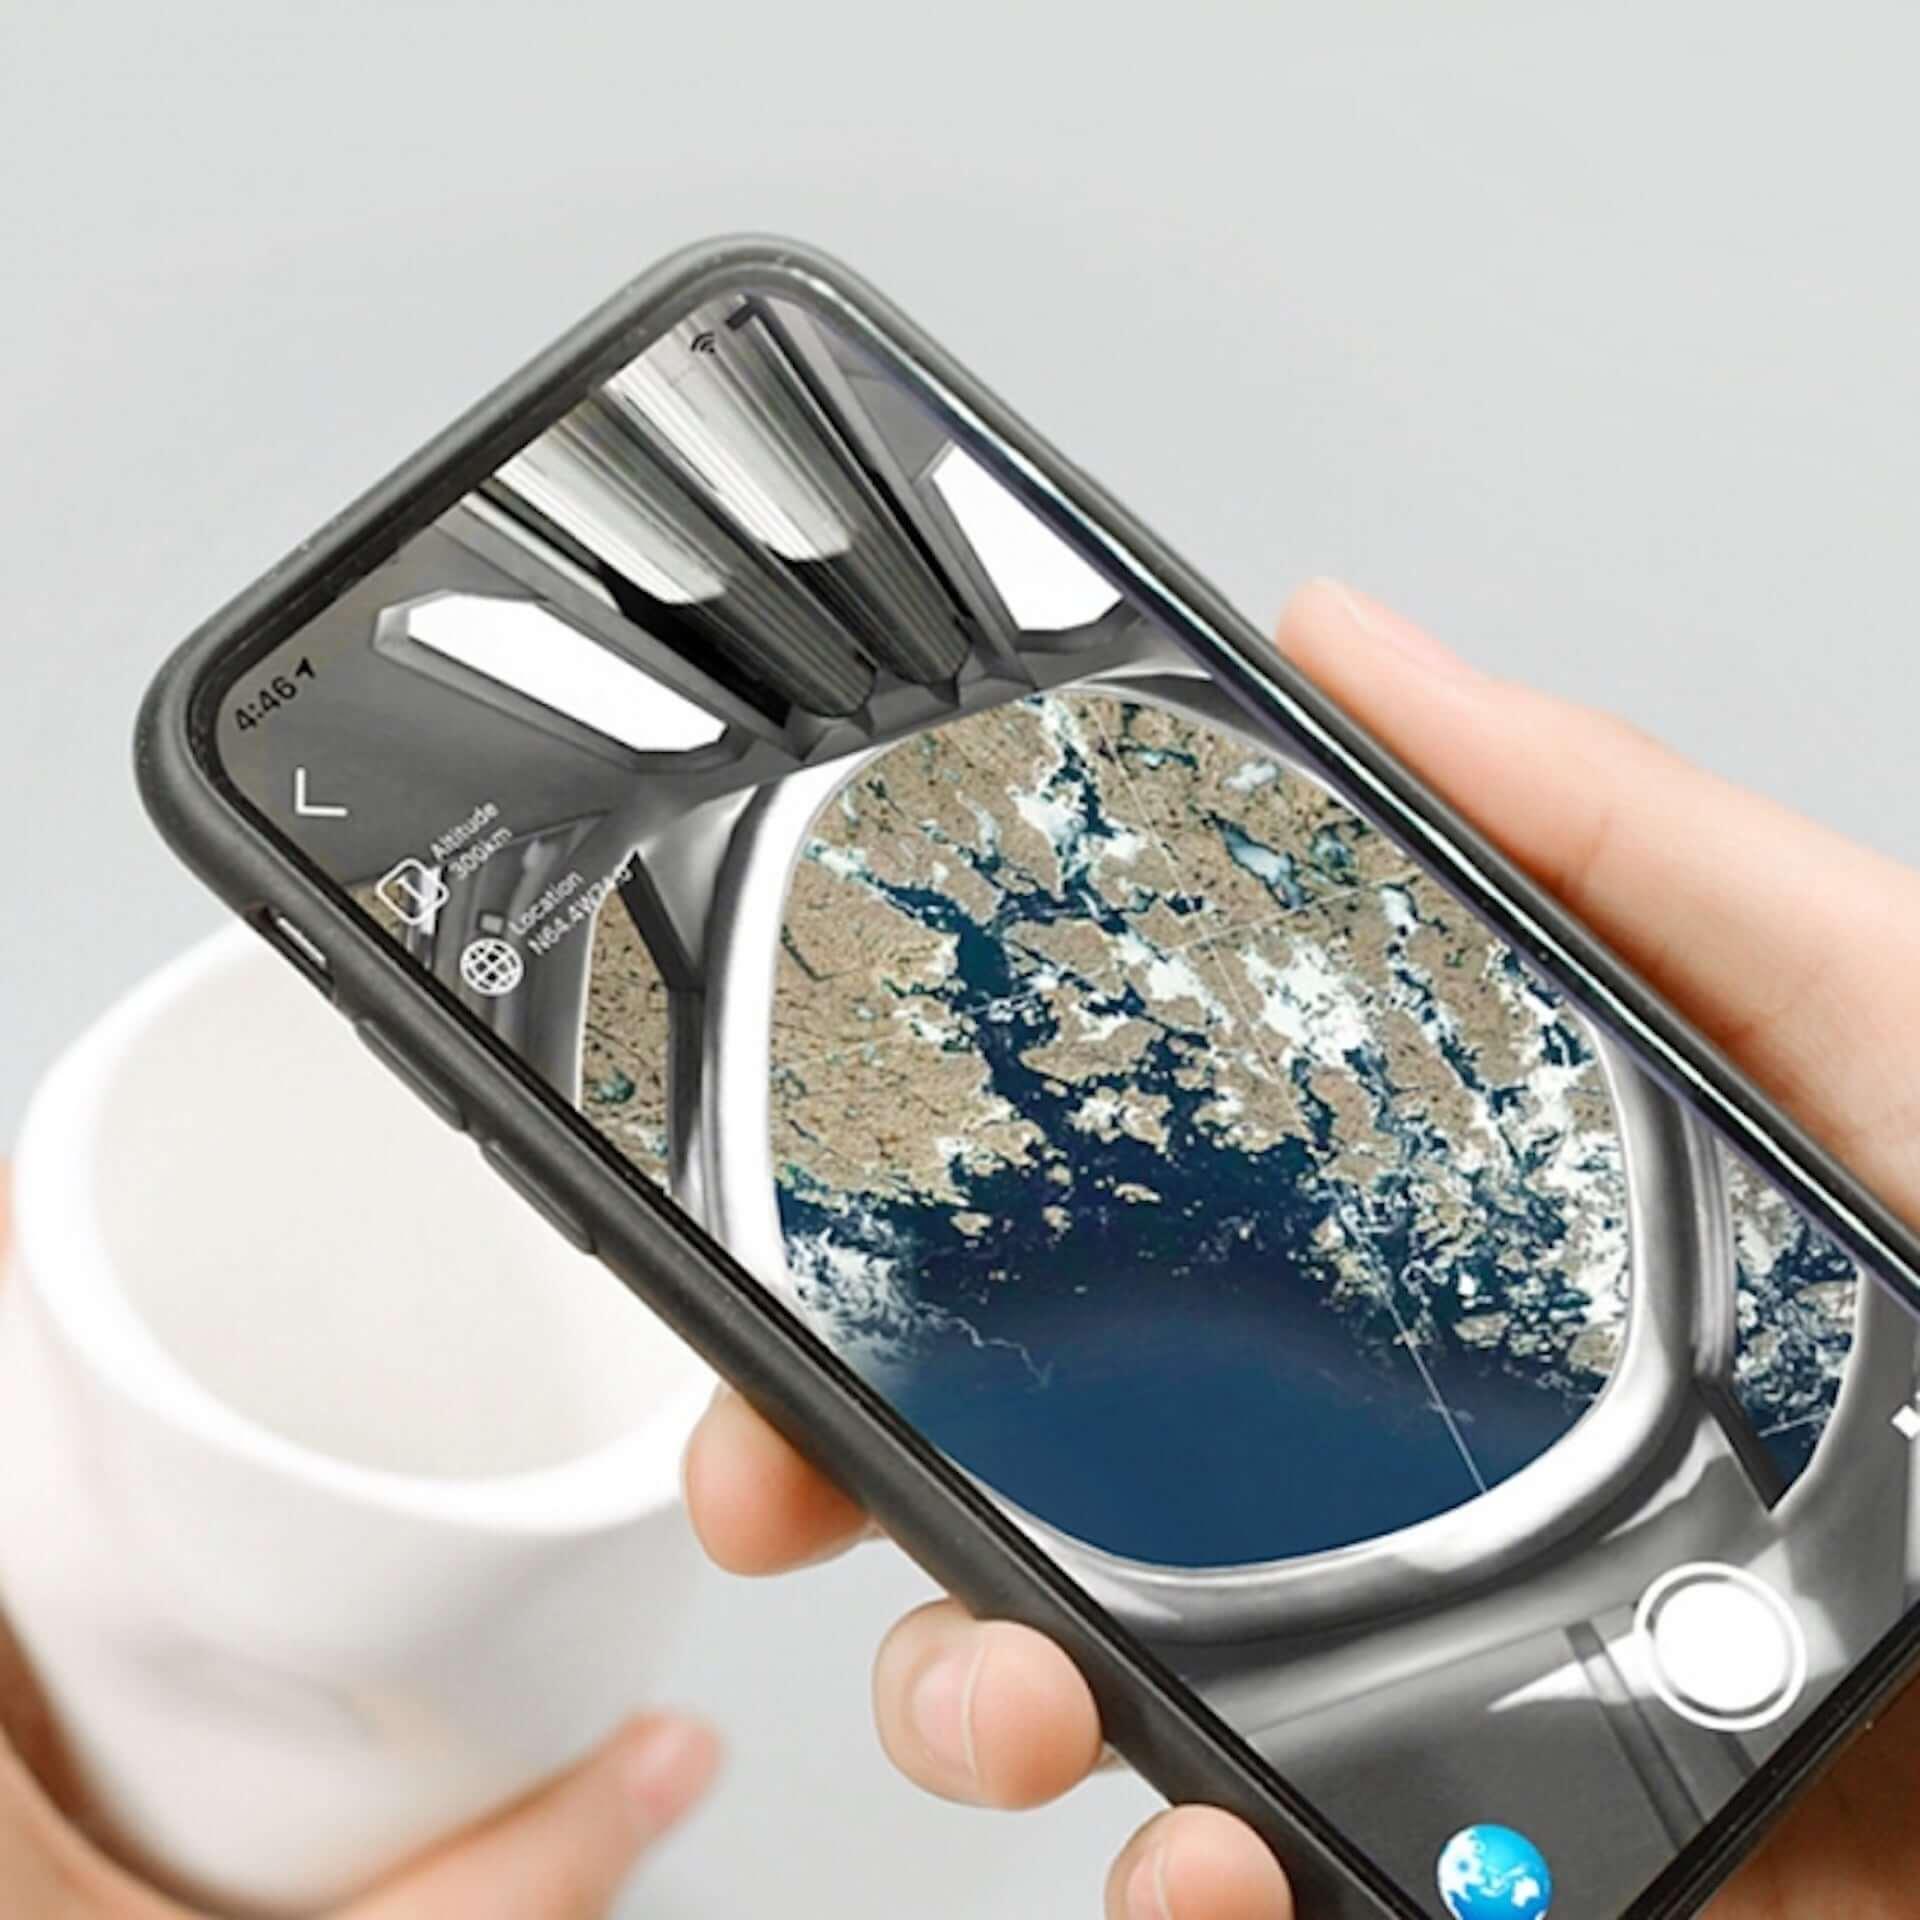 NASA公認&設立60周年記念のARマグカップ!宇宙船からの眺めを体験できる『Space Mug』がGLOTURE.JPに再入荷 tech200729_gloture_1-1920x1920